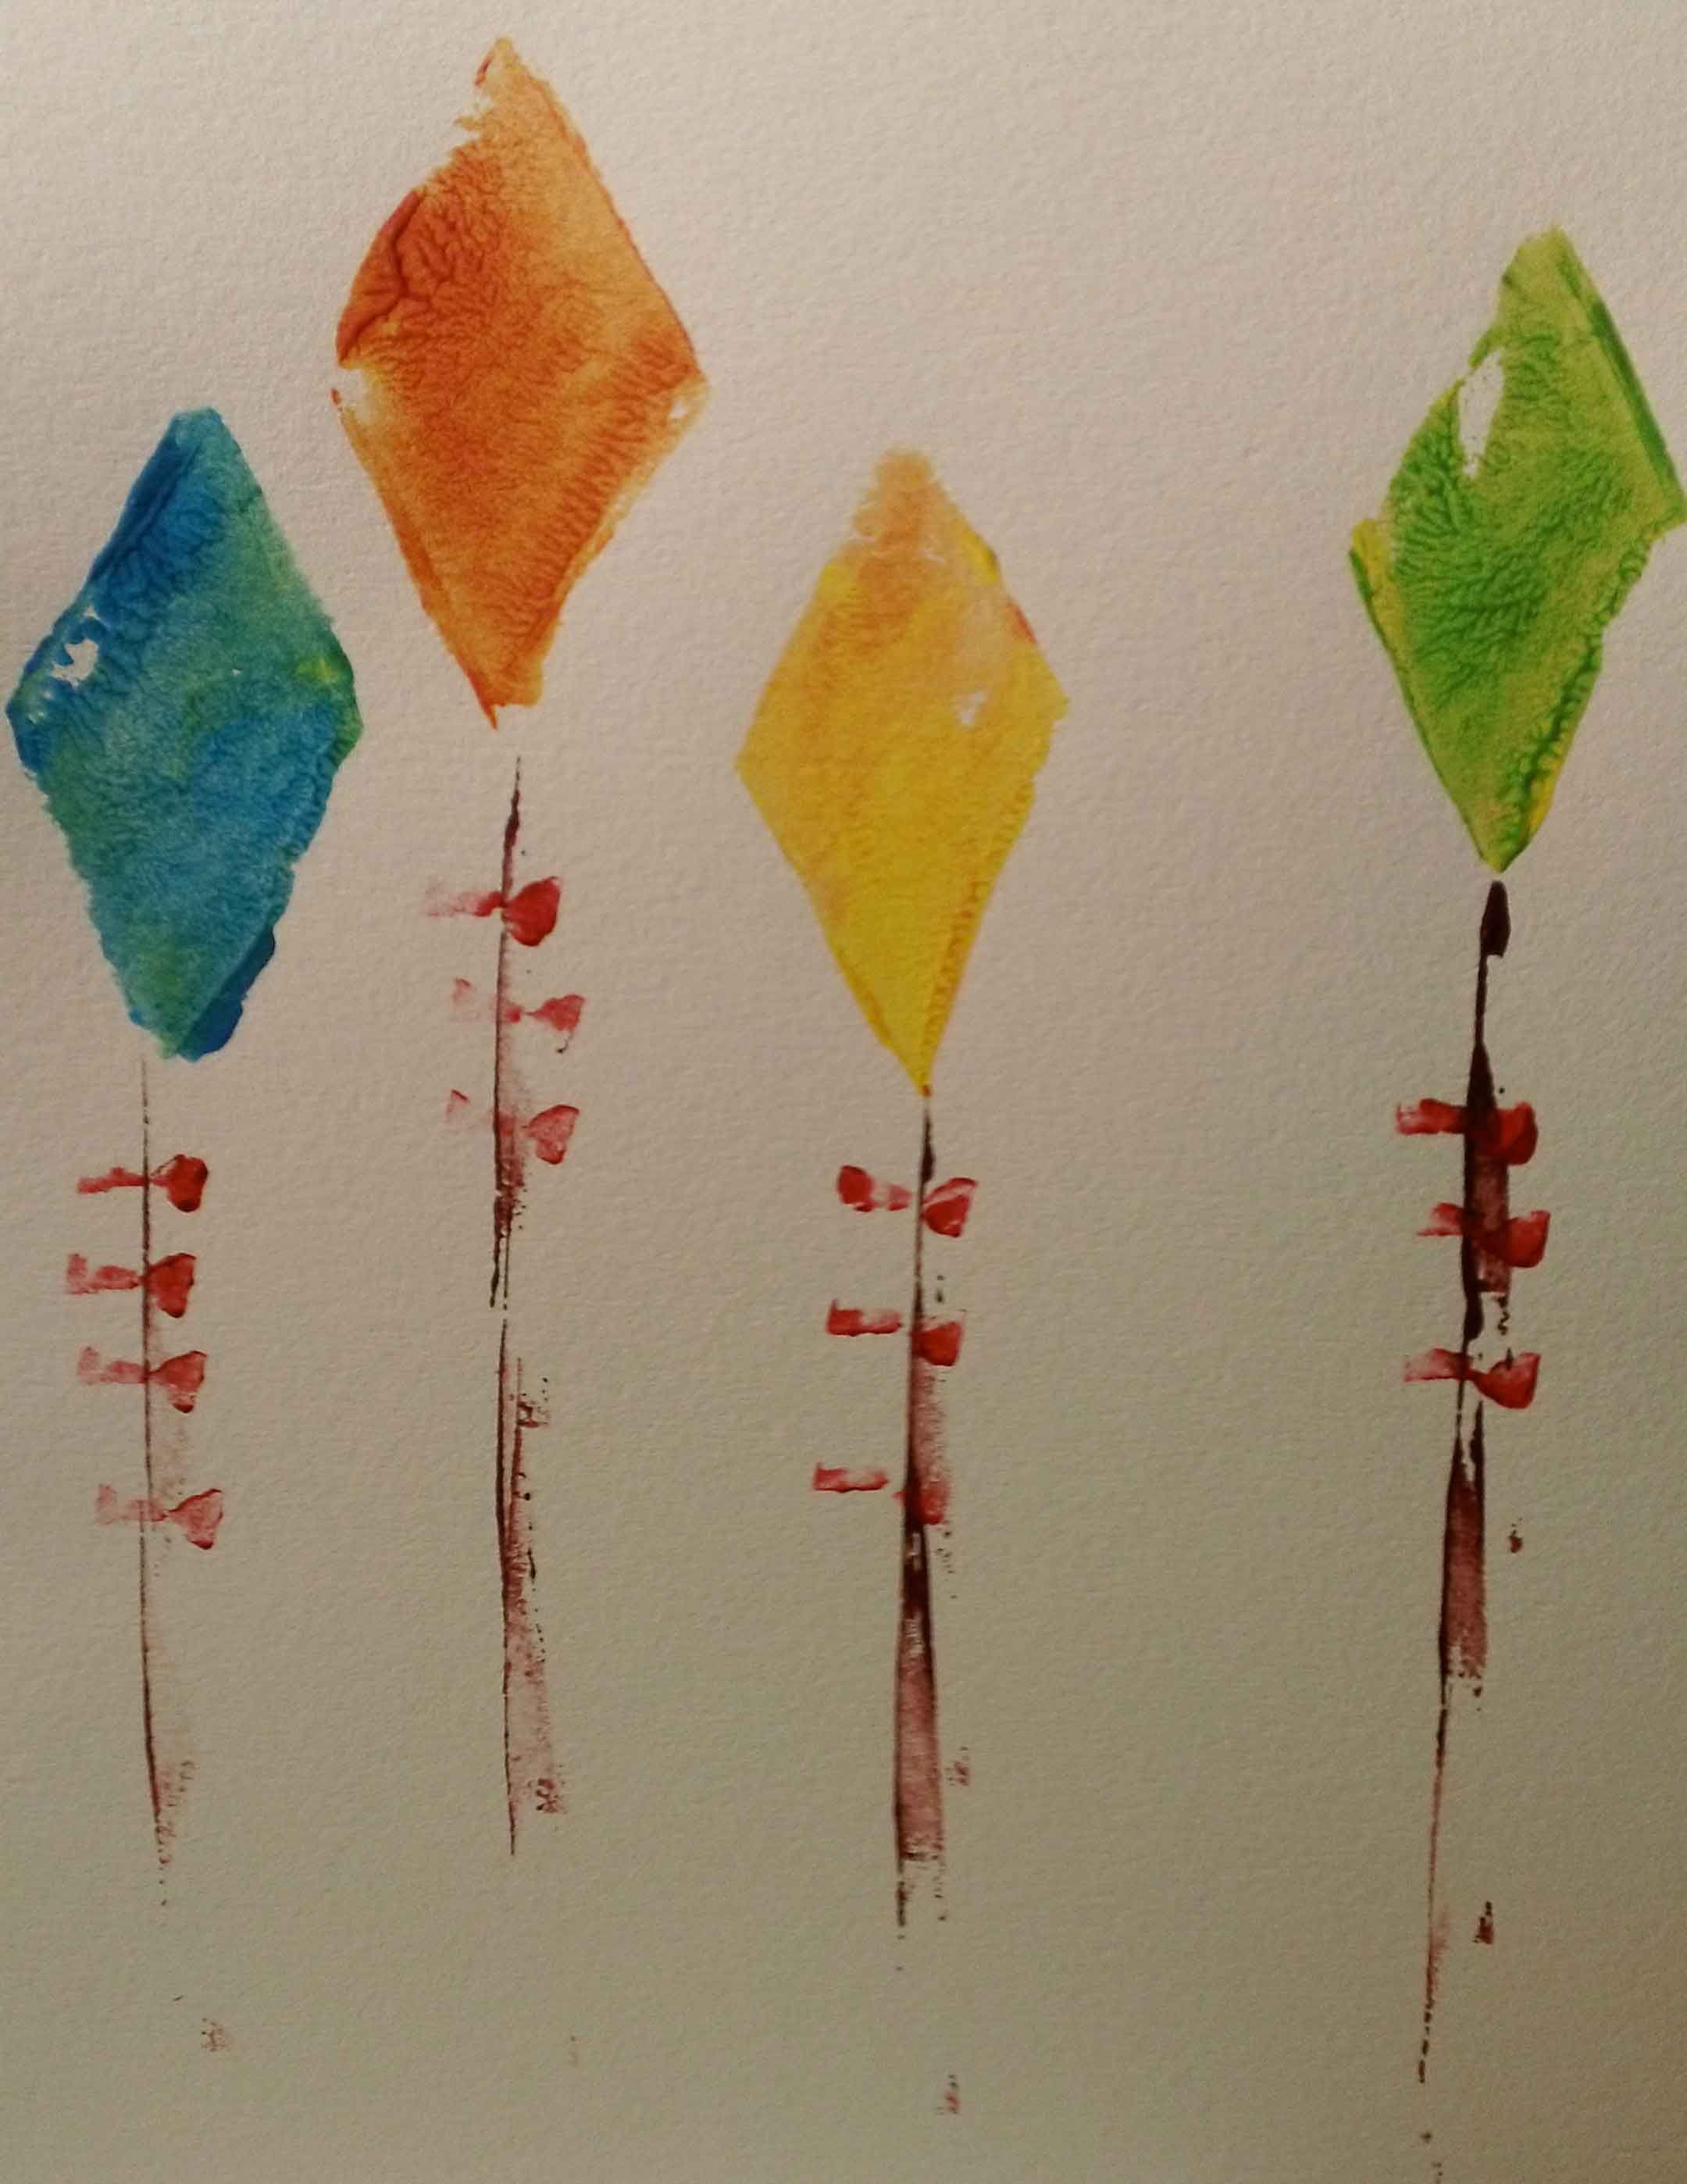 Kites Stamped With Potatos Eco Friendly Crafts At Okidsart